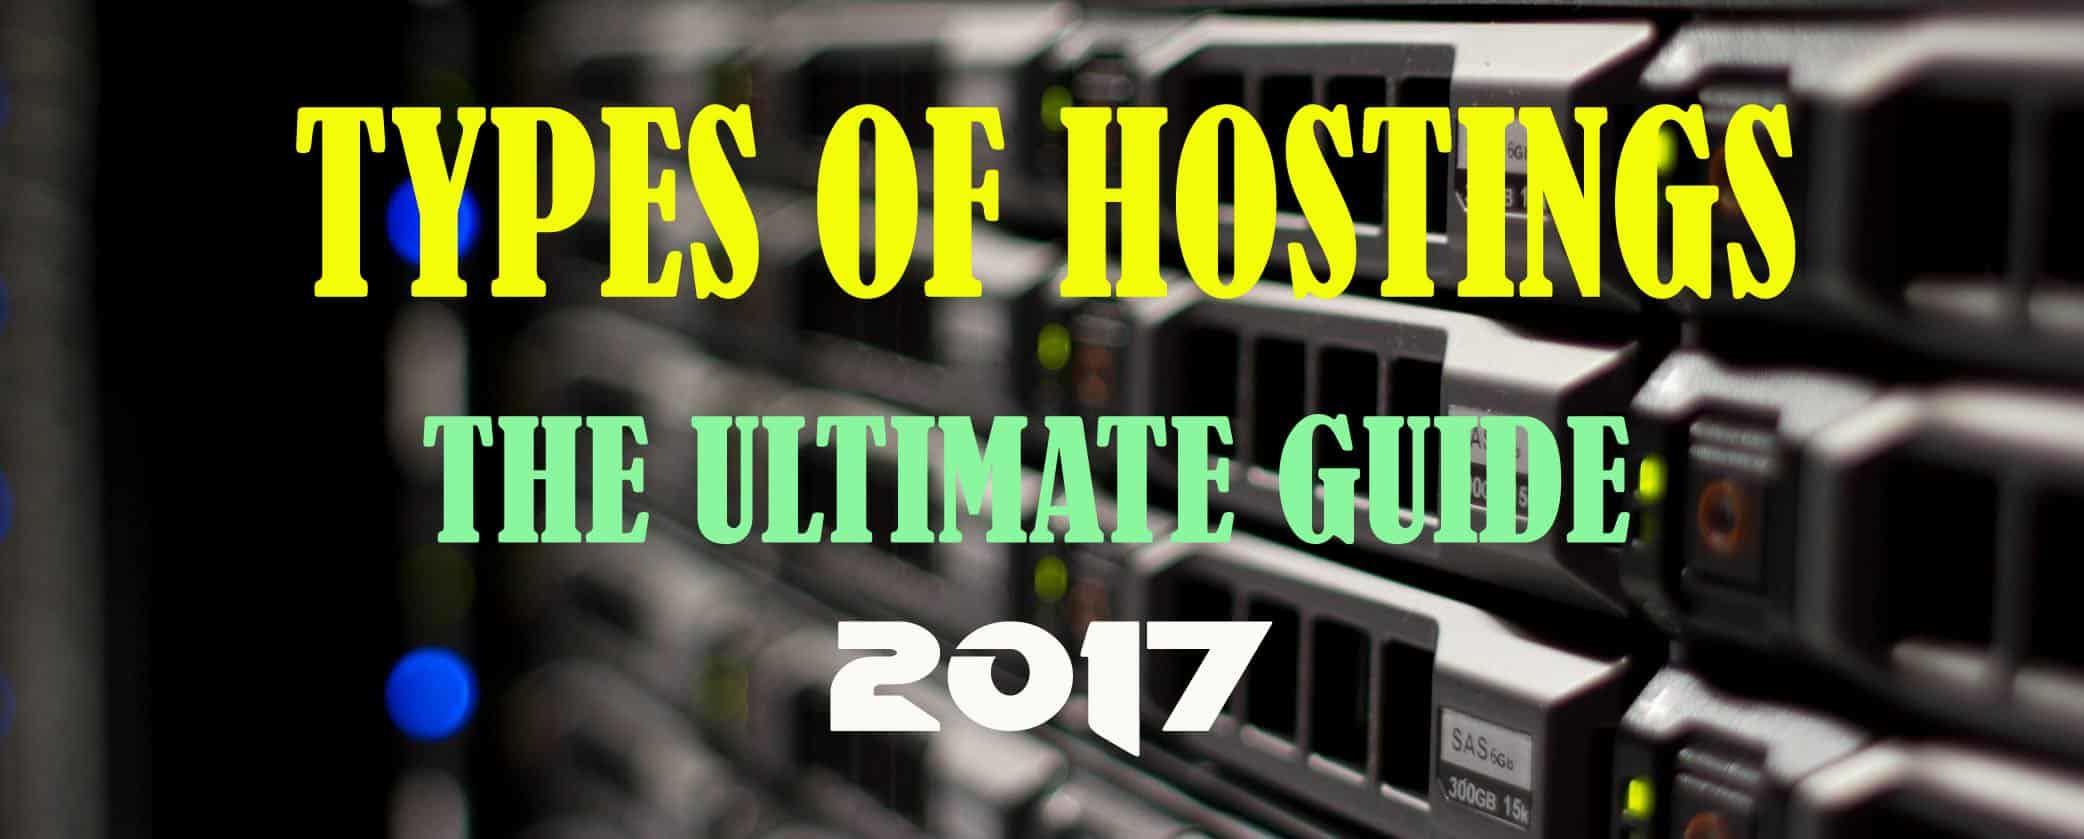 hosting types 2017